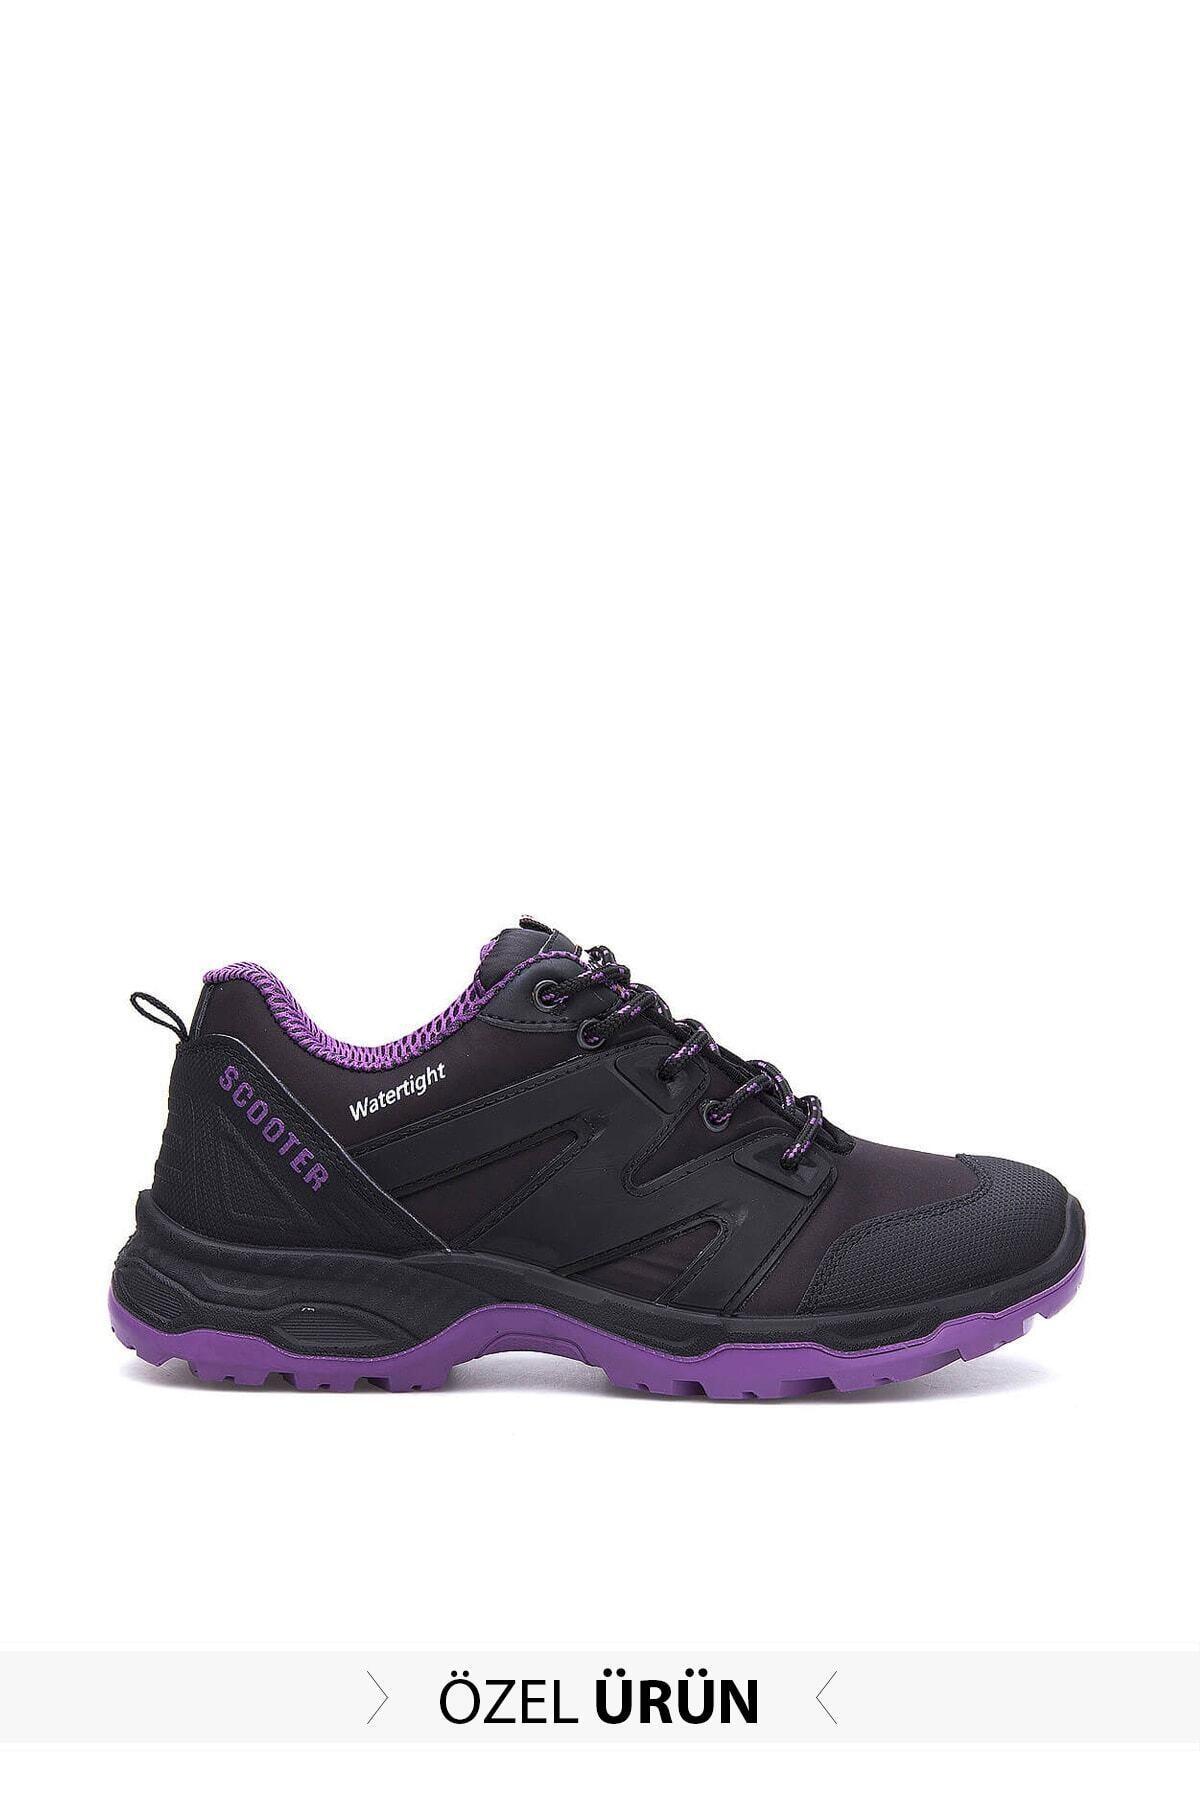 Scooter Kadın Siyah-mor Sneaker - 2jmyw2017034 1